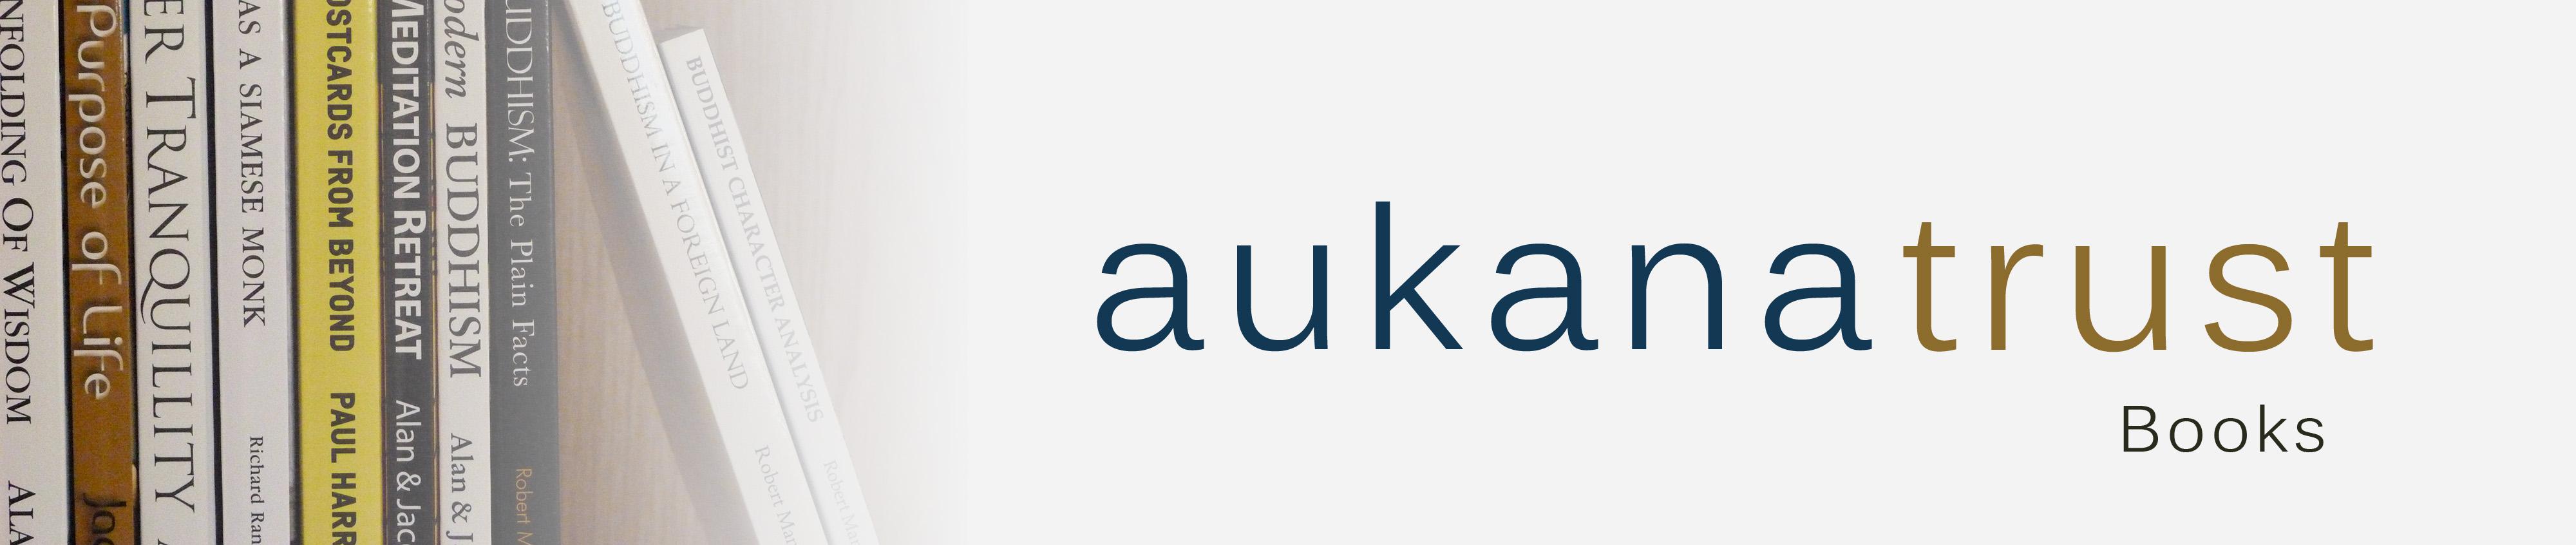 the Aukana Bookshop